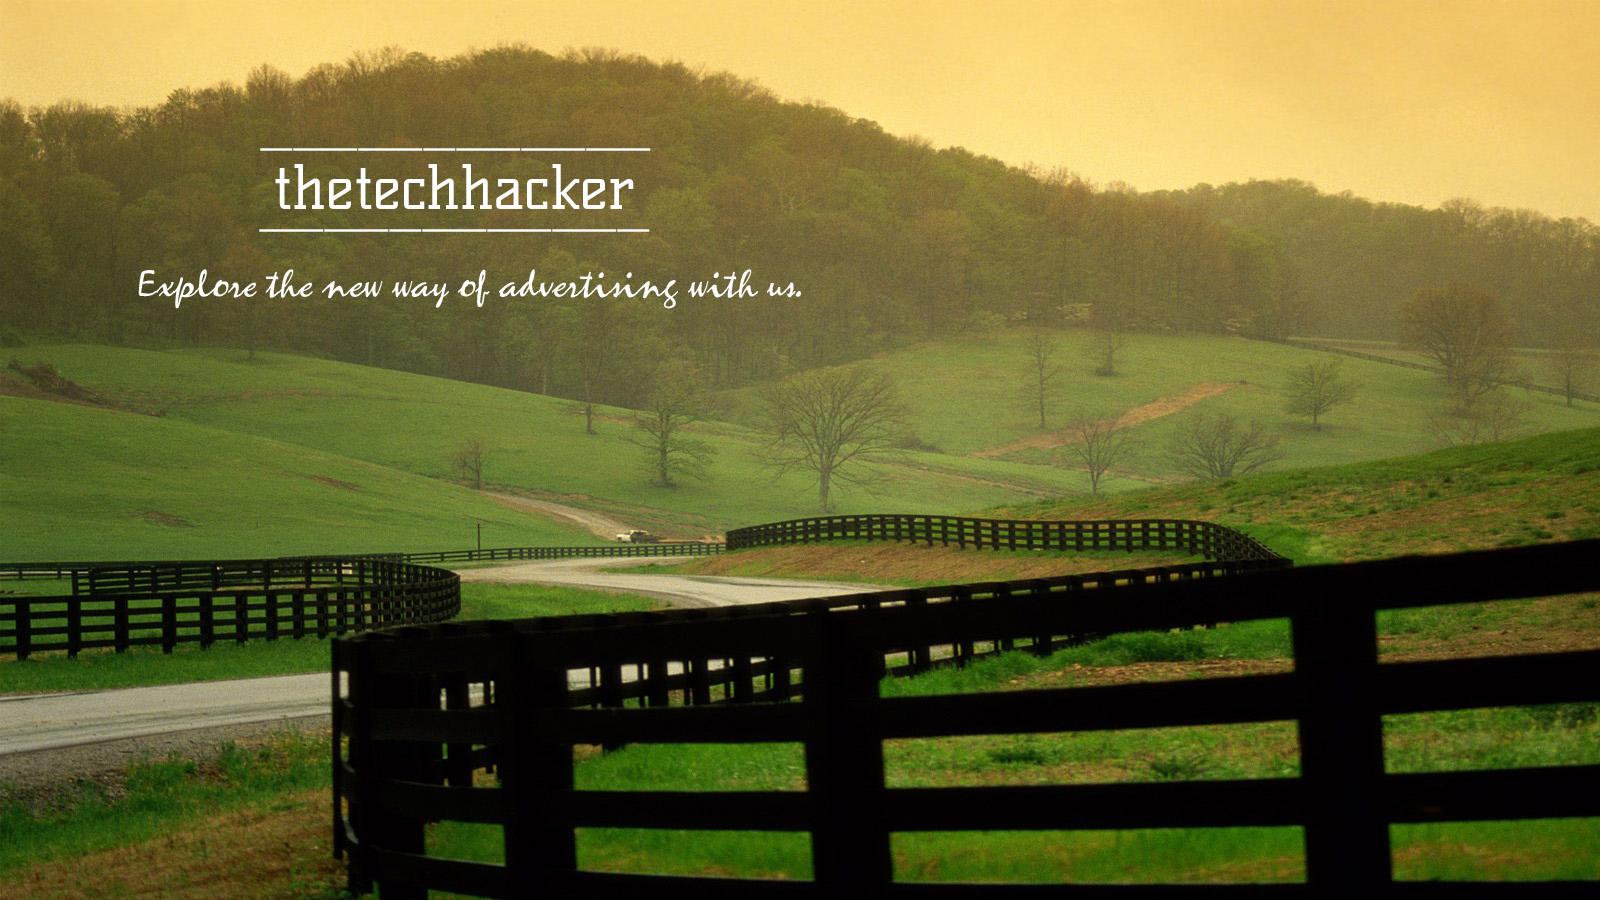 Explore New Ways of Advertising on thetechhacker